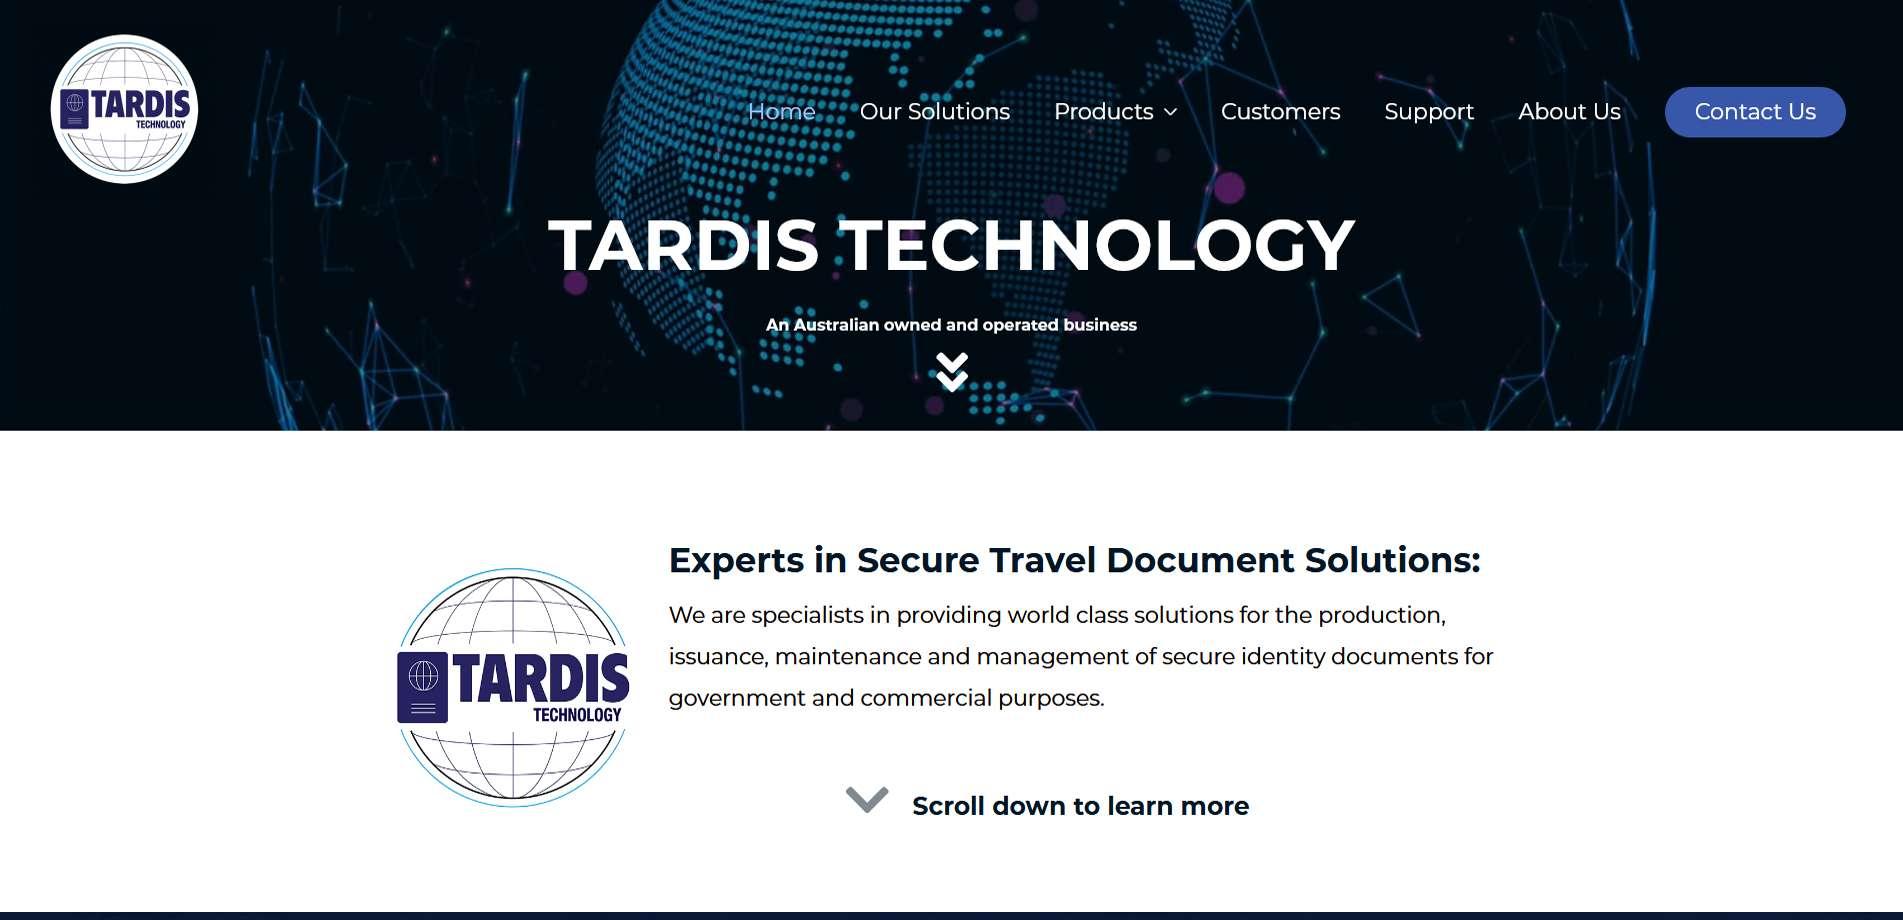 tardis canberra web design